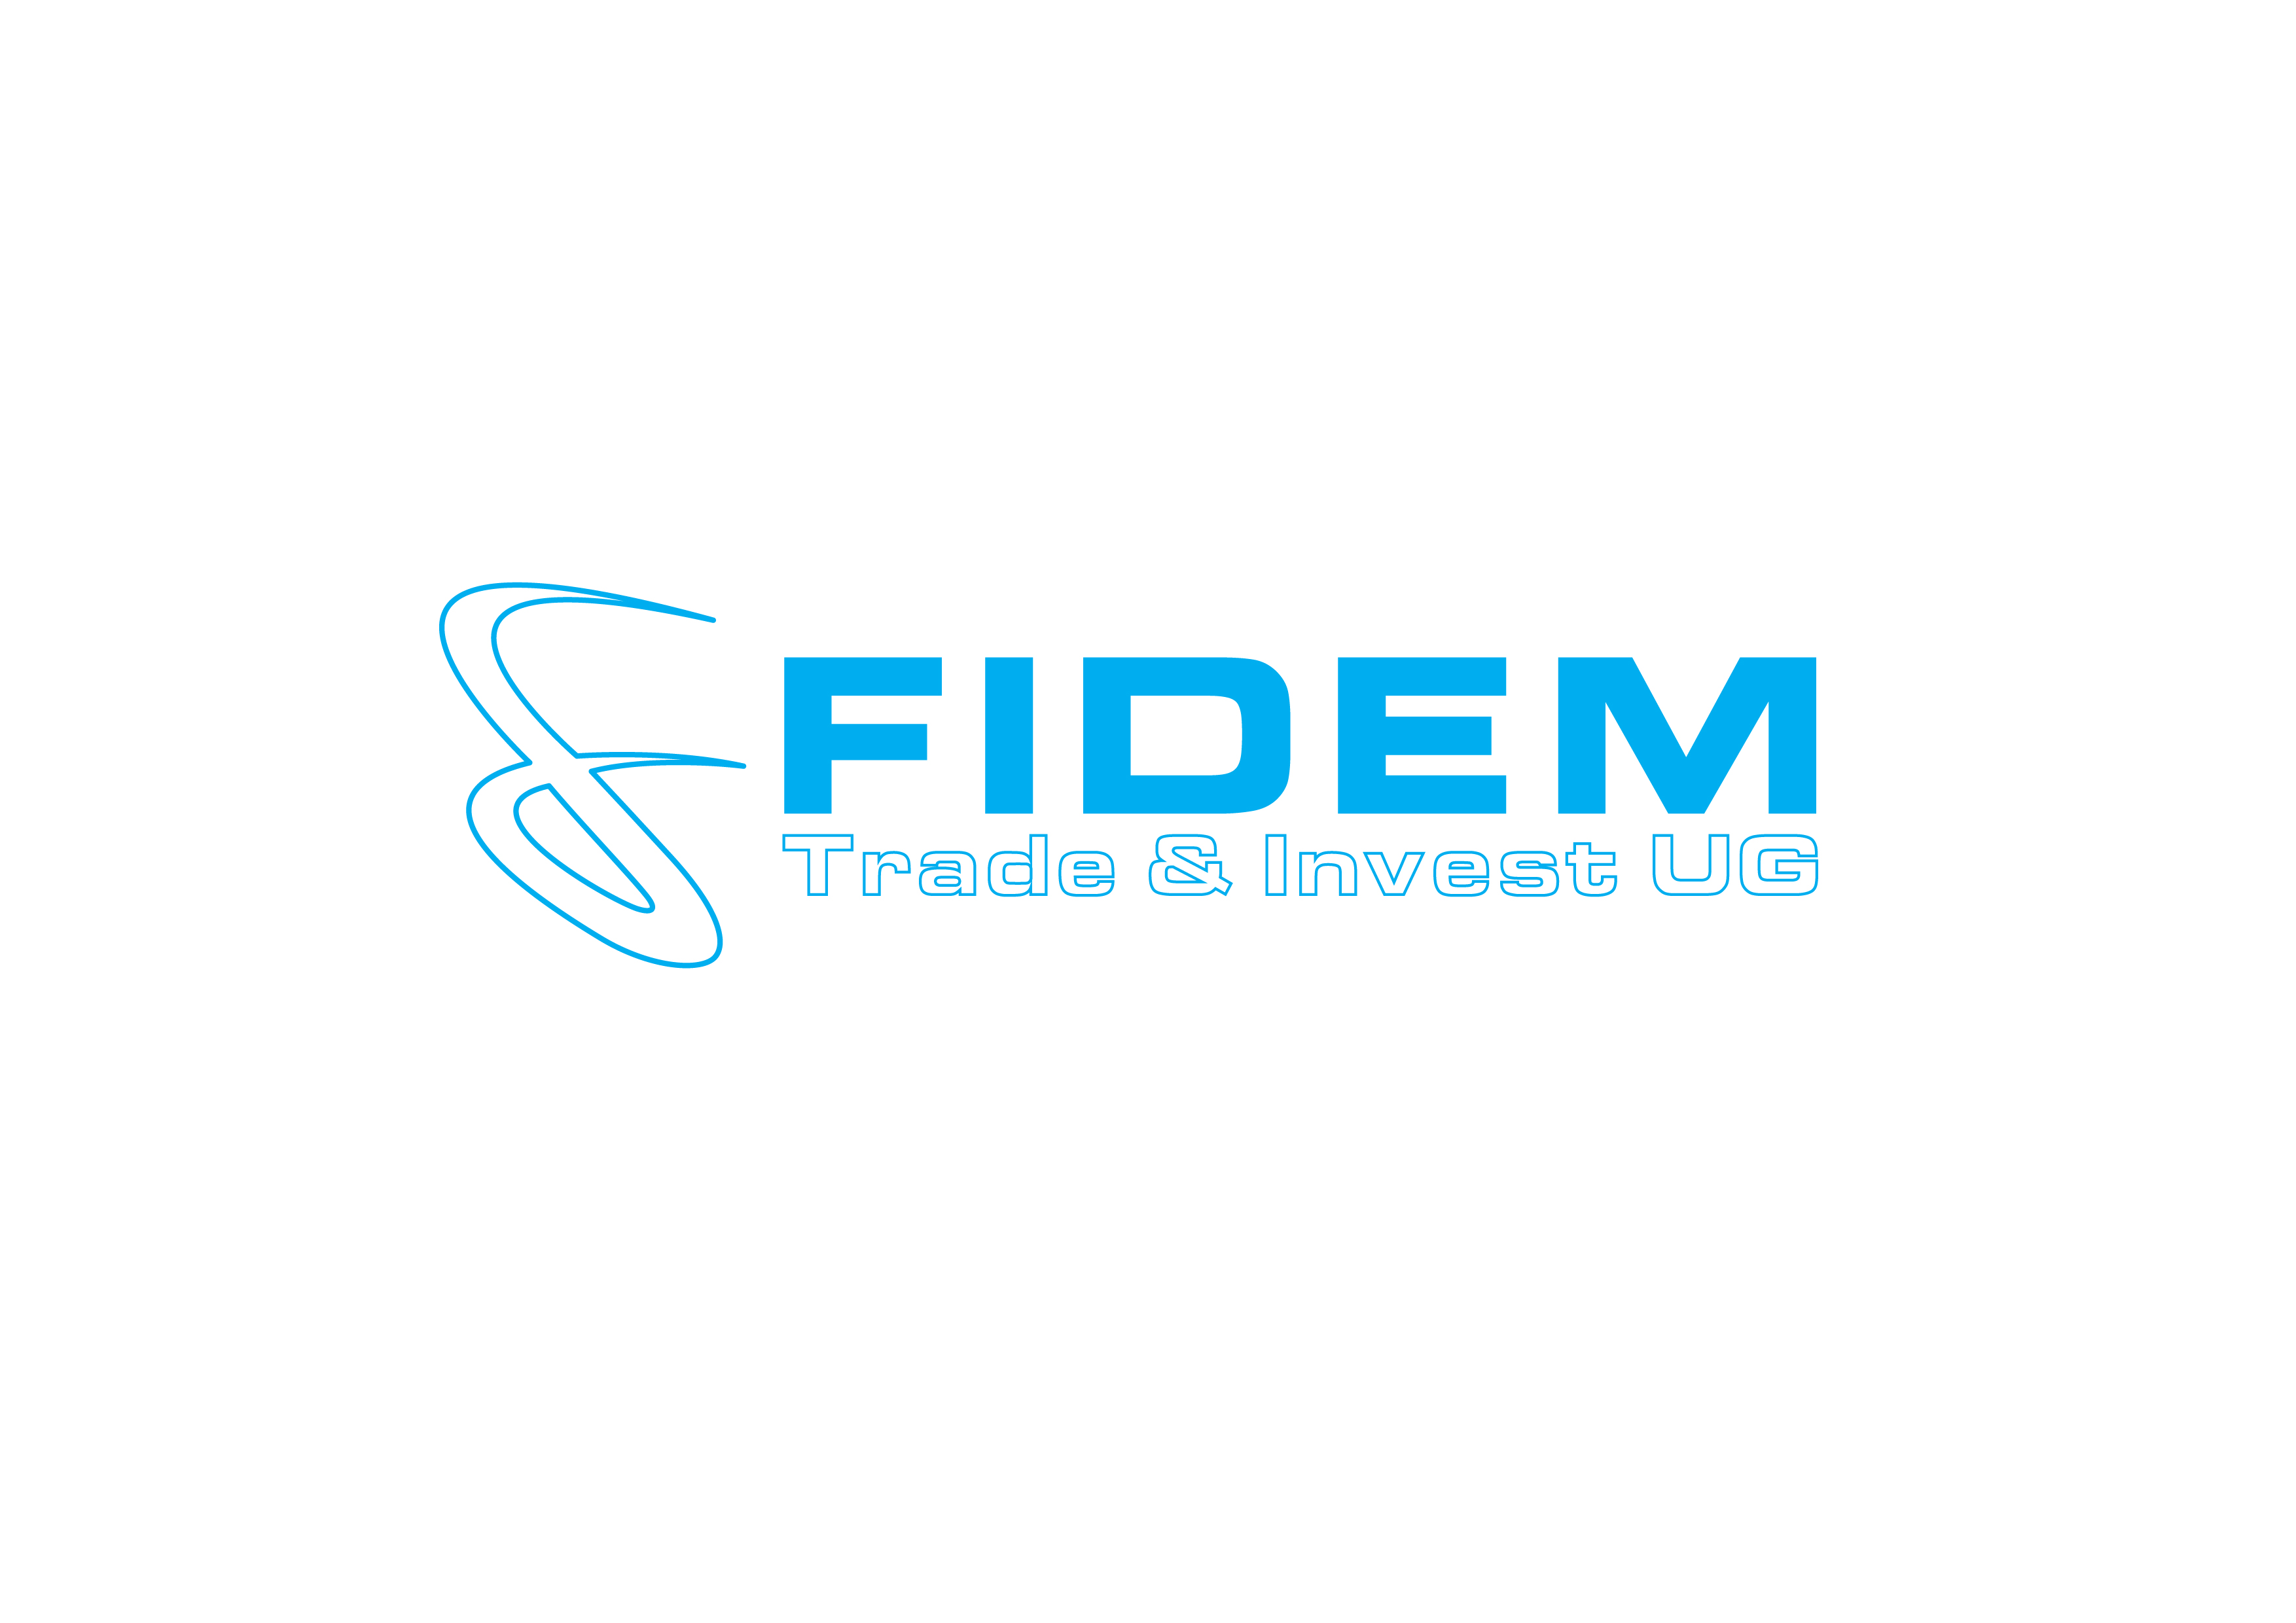 Logo Design by 3draw - Entry No. 774 in the Logo Design Contest Professional Logo Design for FIDEM Trade & Invest UG.